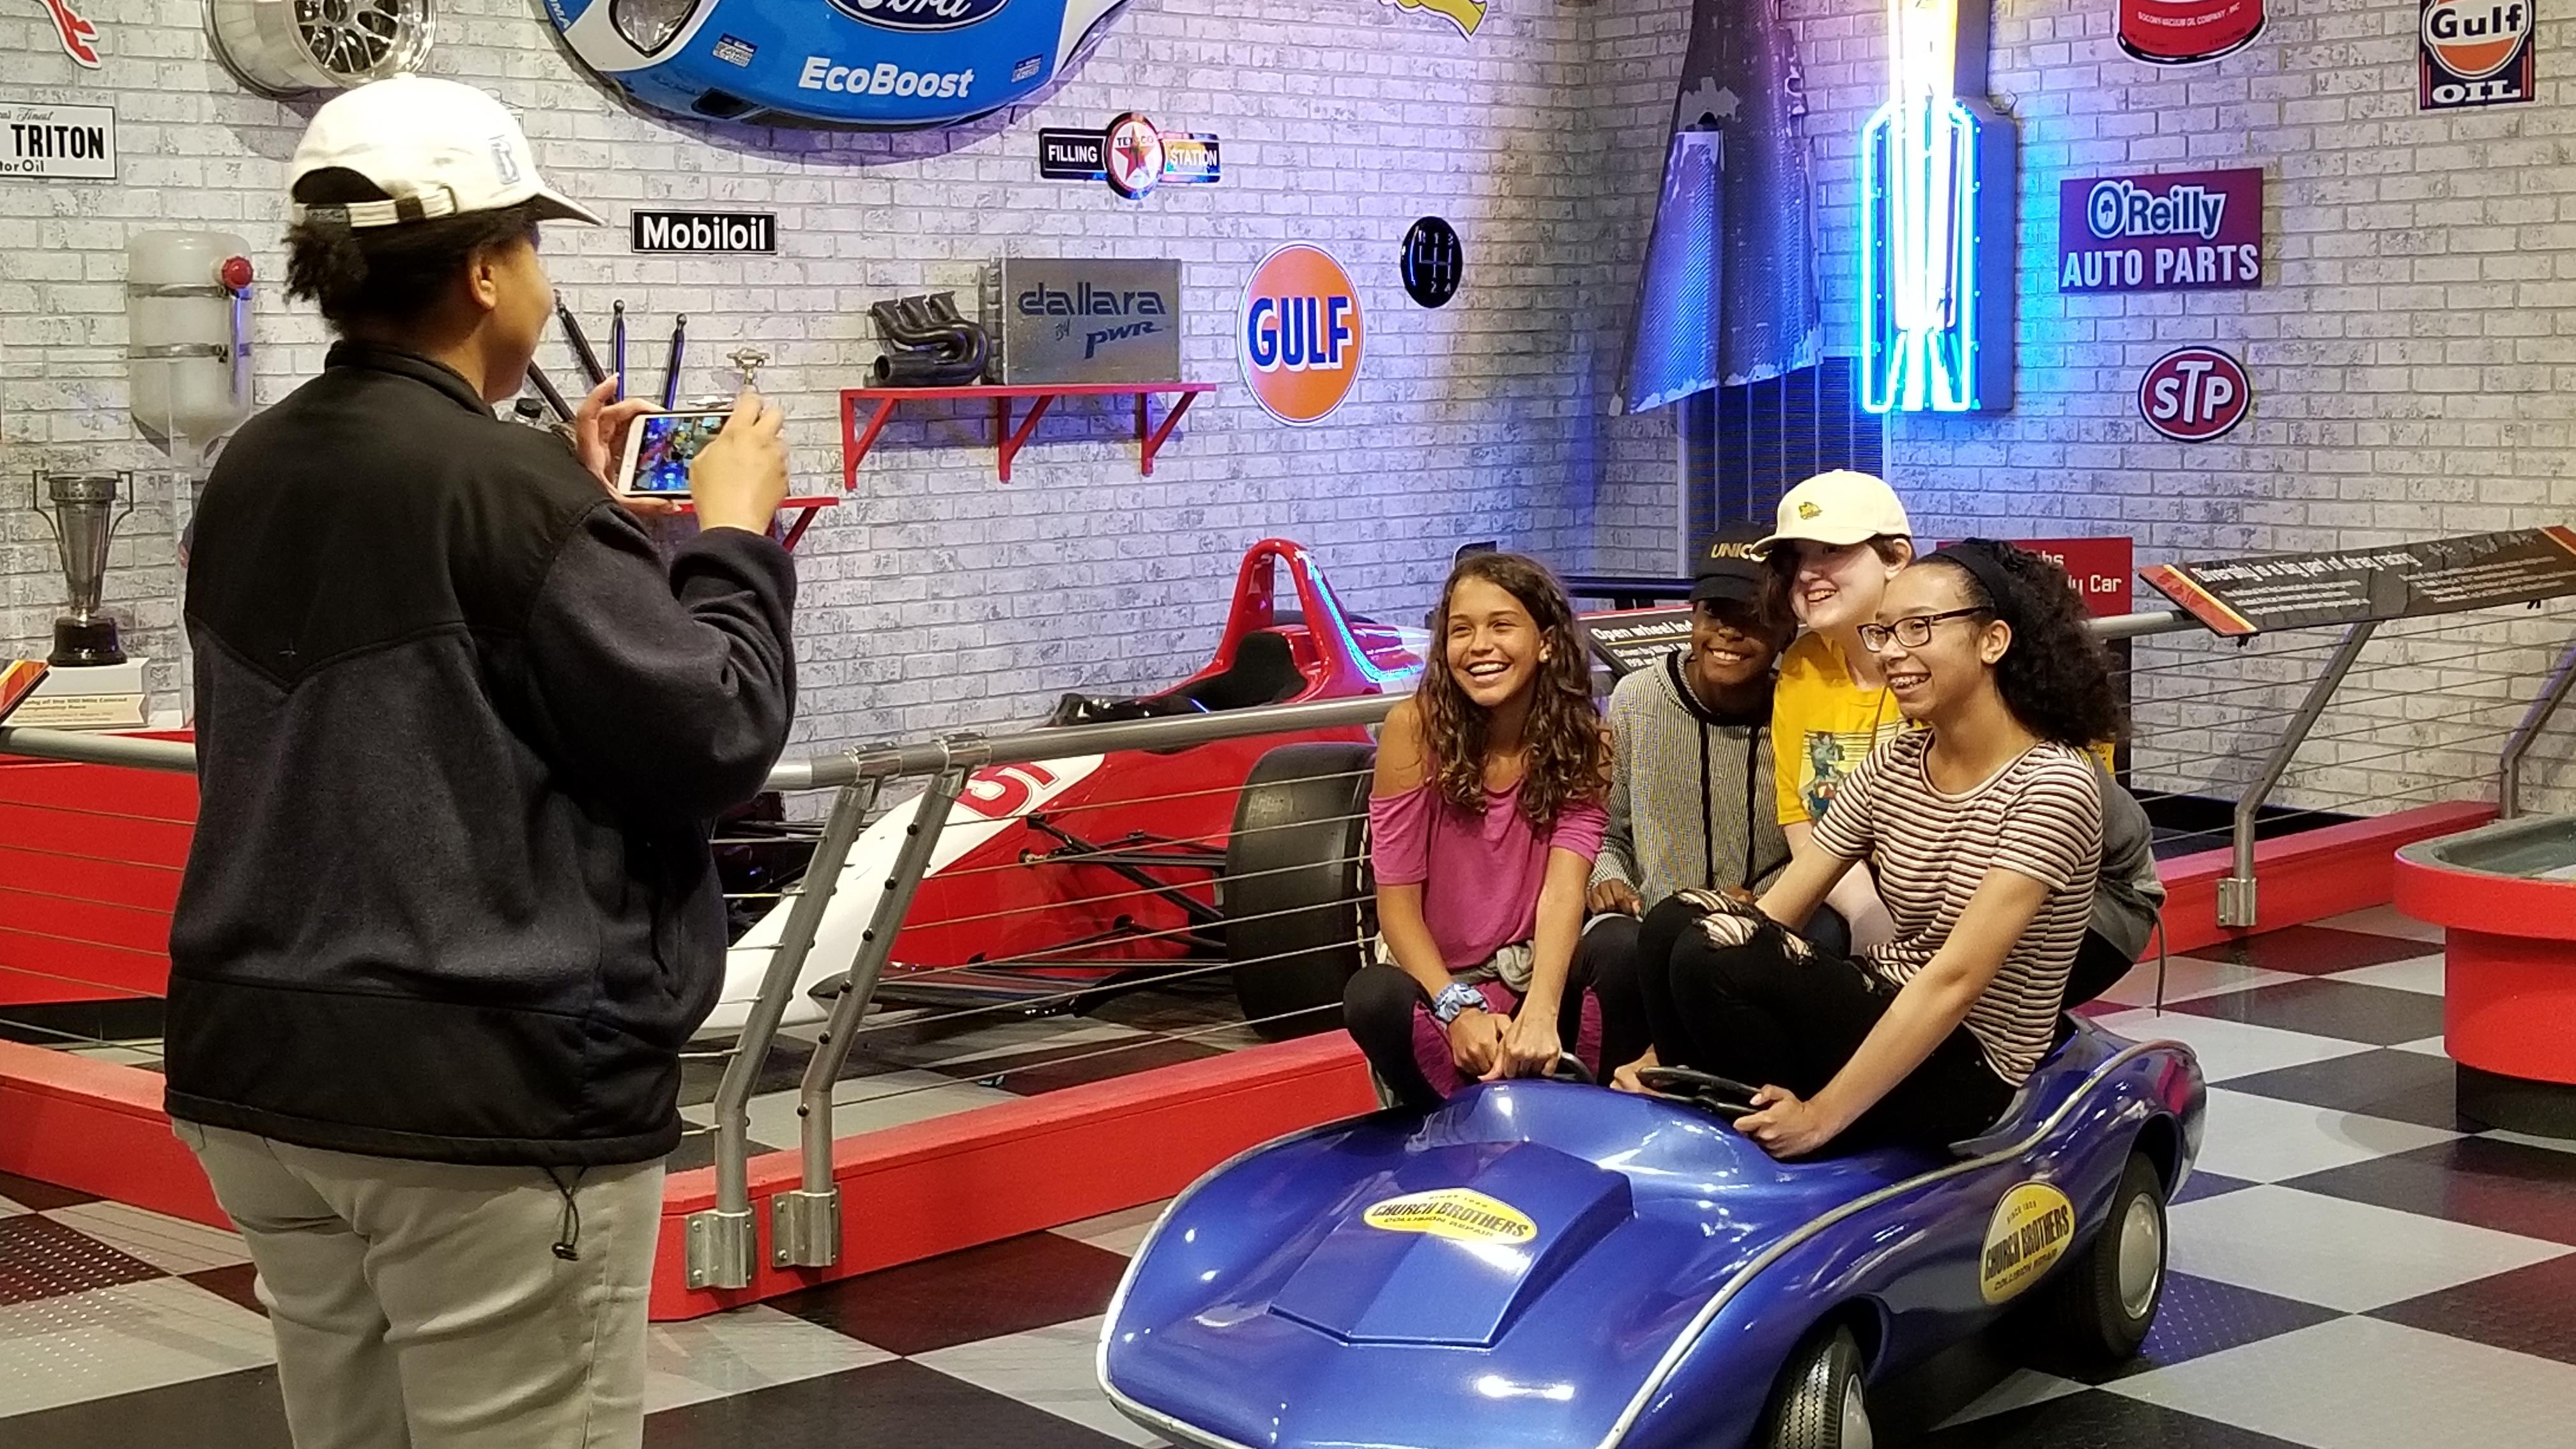 The Children's Museum Indy 500 Exhibit